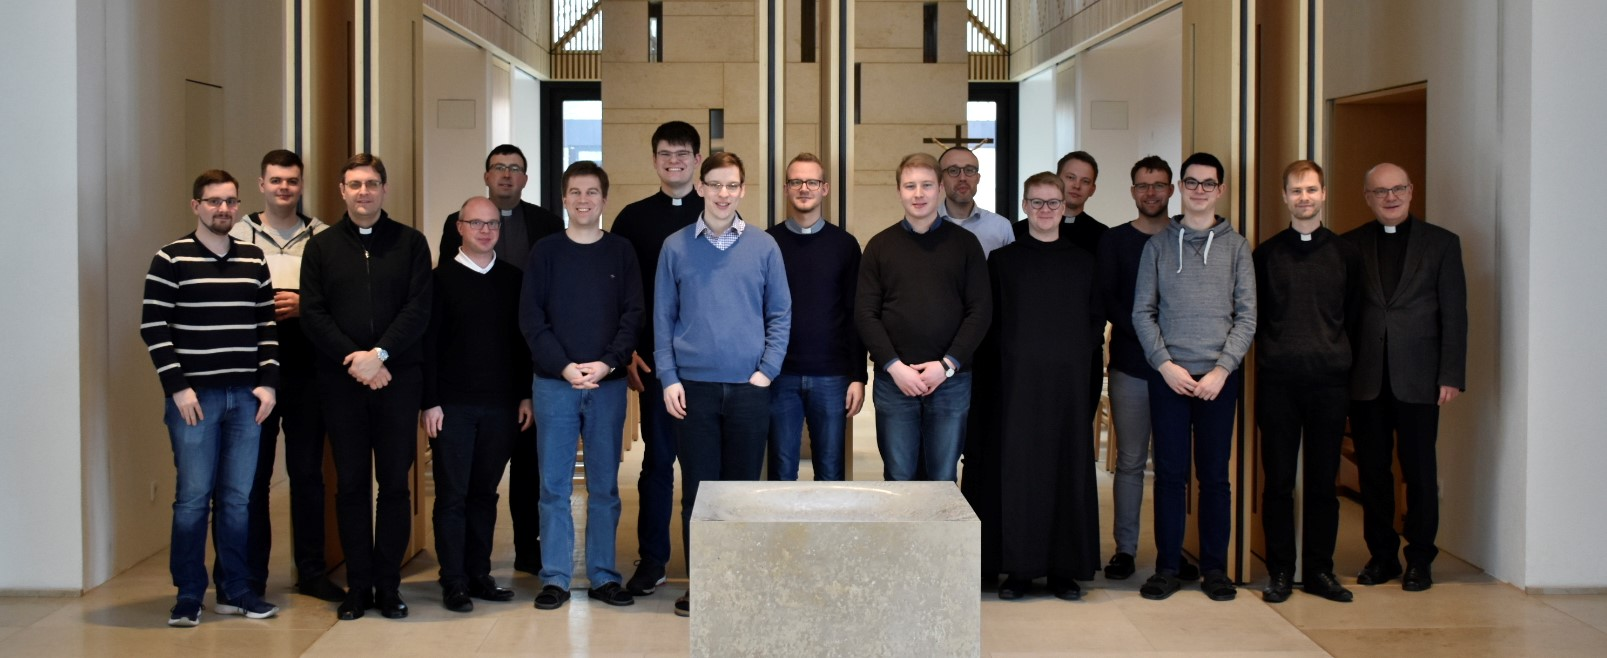 Pastoralkurs (2019-21) zu Block II in Paderborn